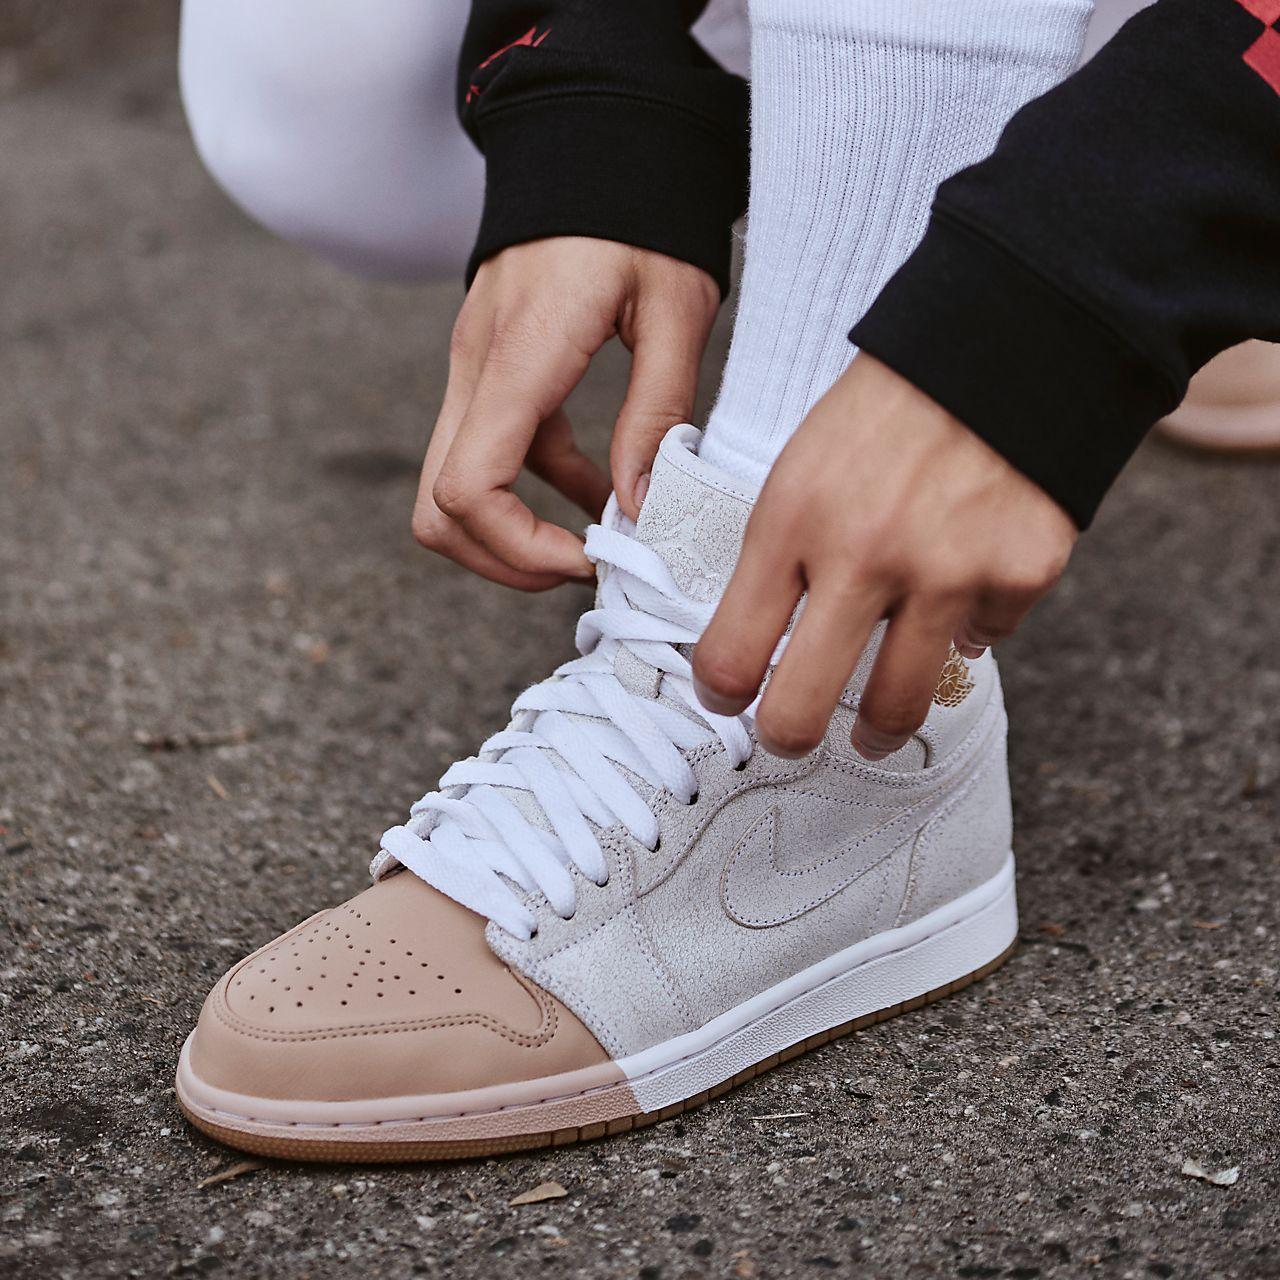 new arrival 676f8 b2556 ... Nike Air Jordan 1 Retro High Premium Women s Shoe